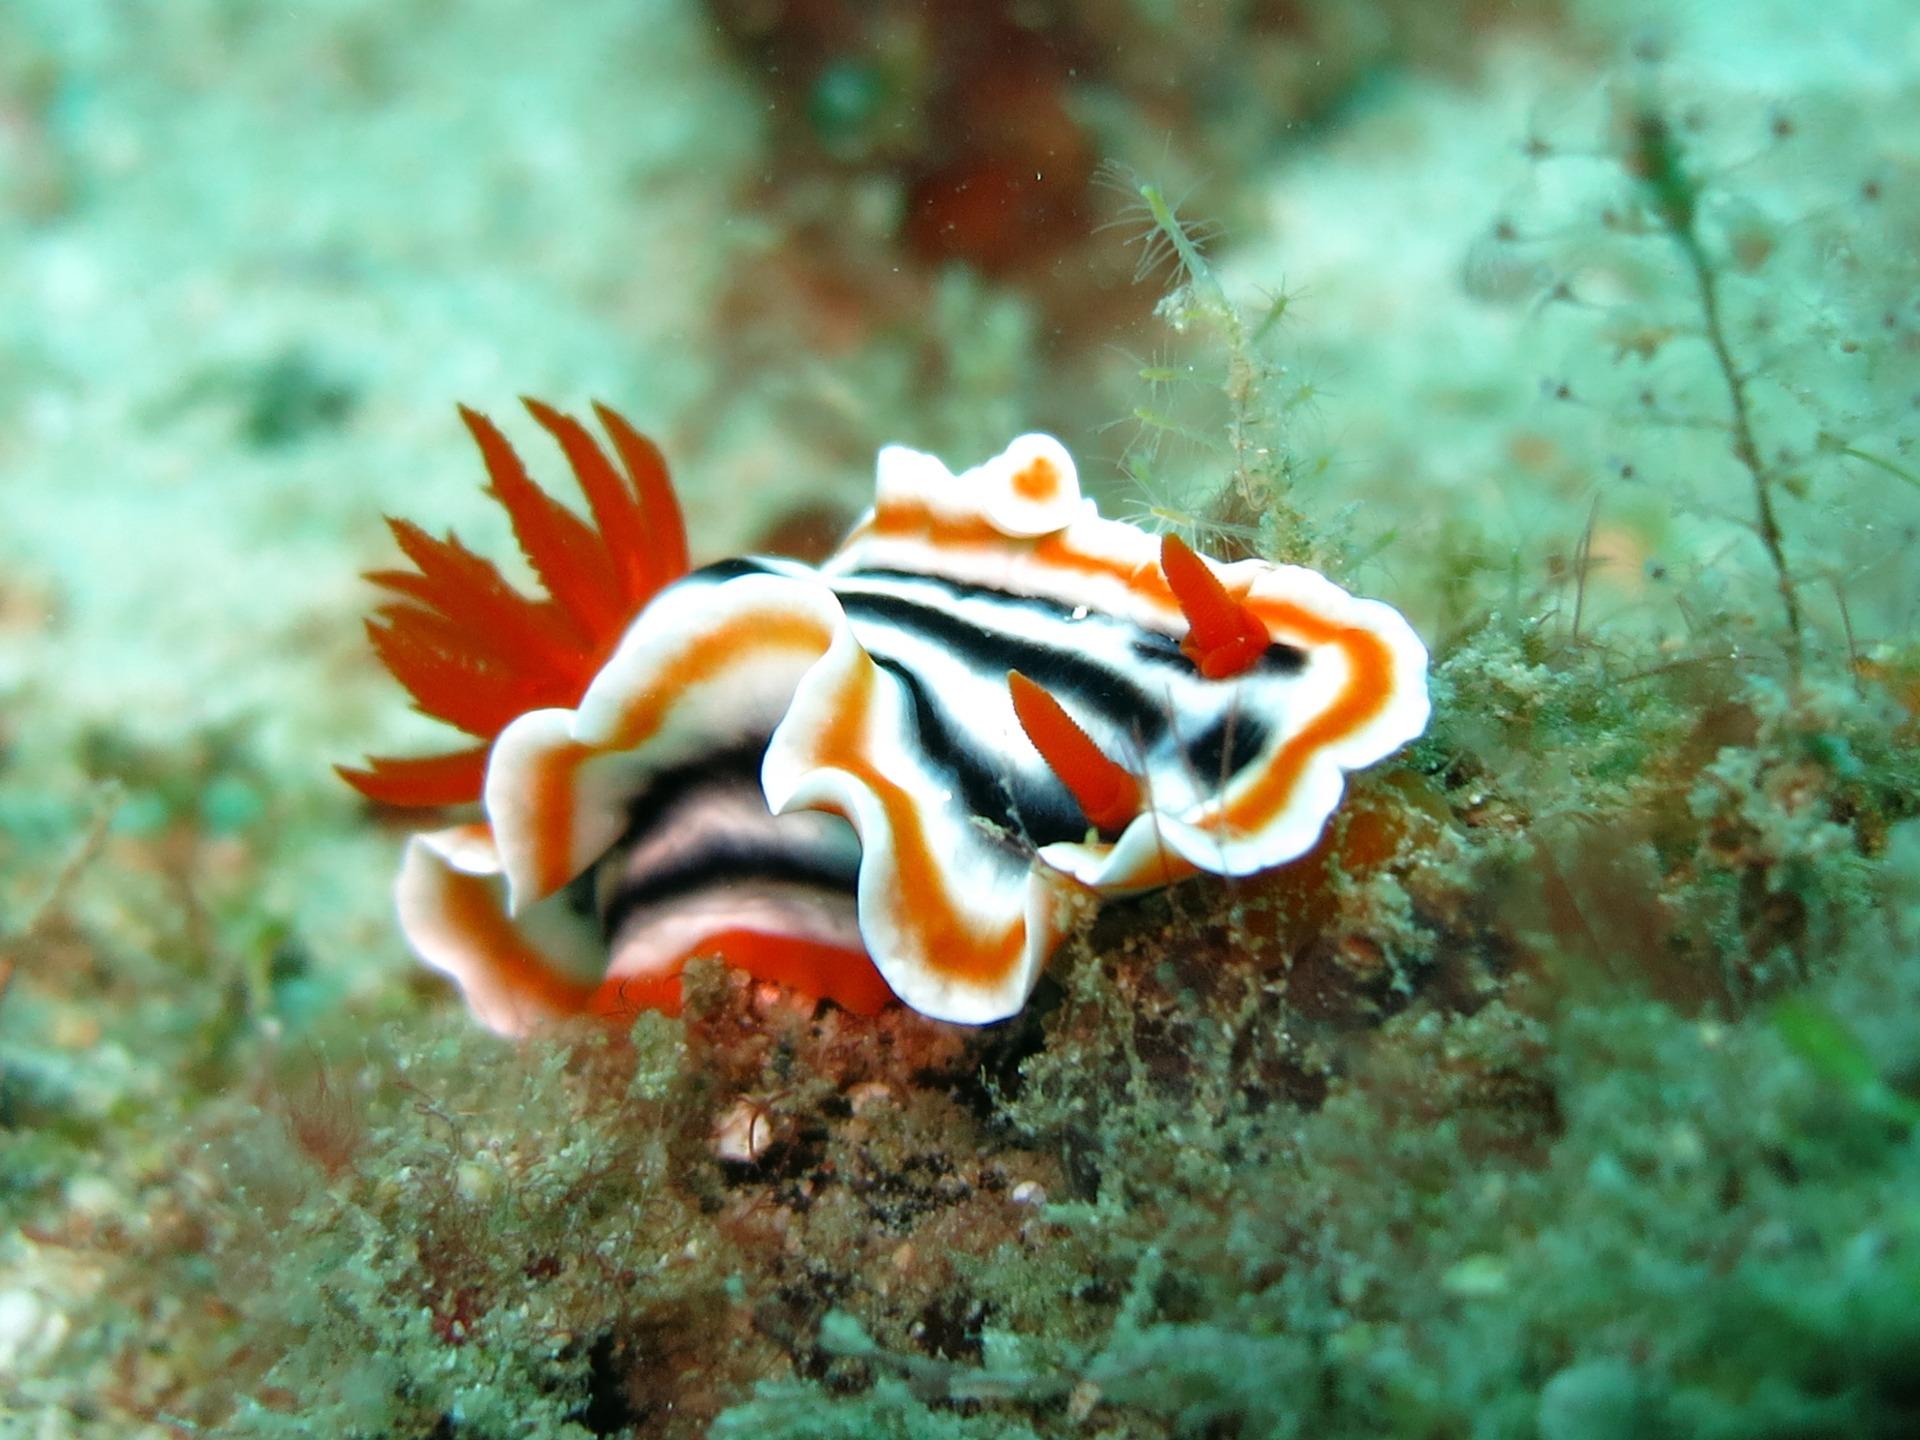 Underwater macro photography